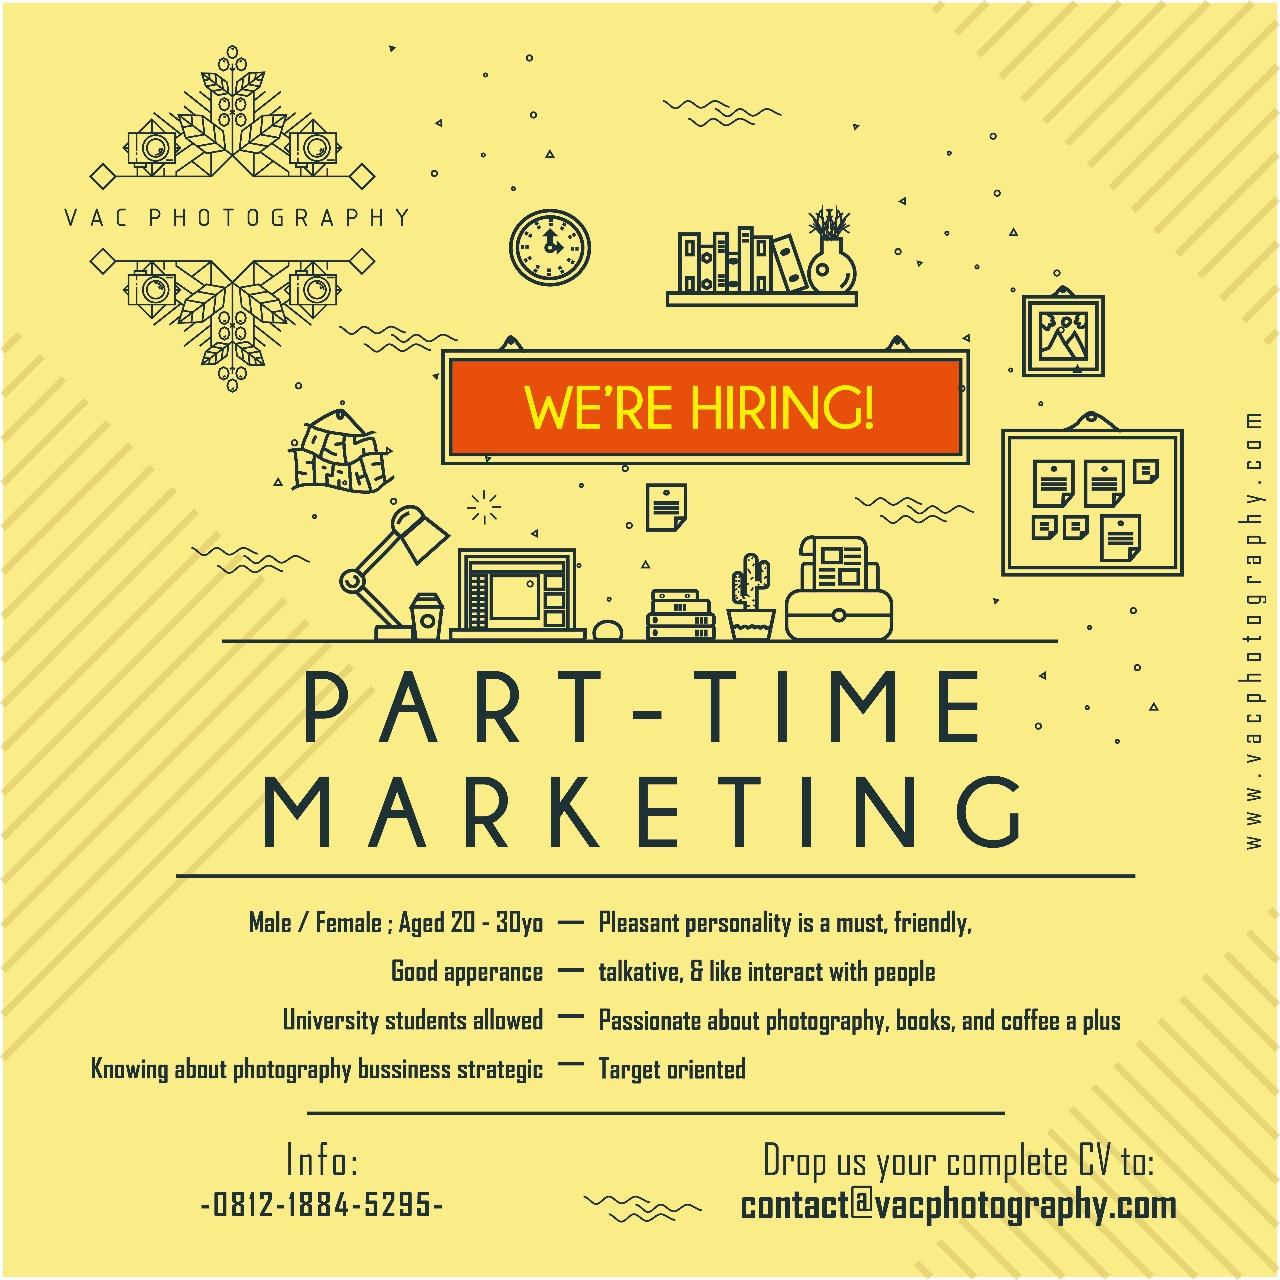 Lowongan Kerja Part Time Marketing Di Vac Photography Yogyakarta